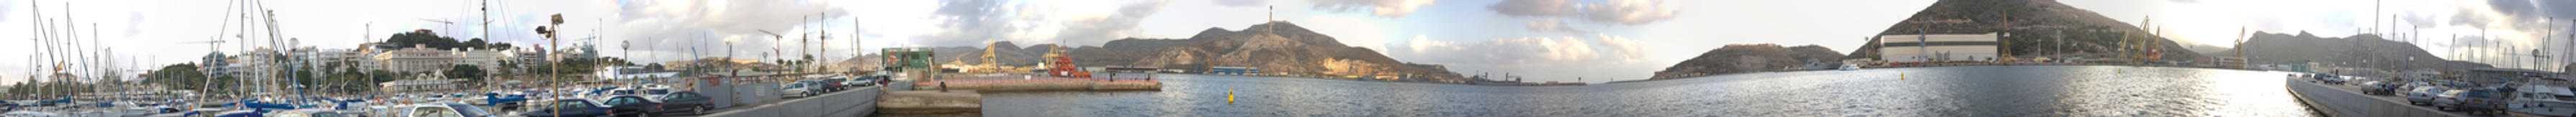 Puerto by meropx